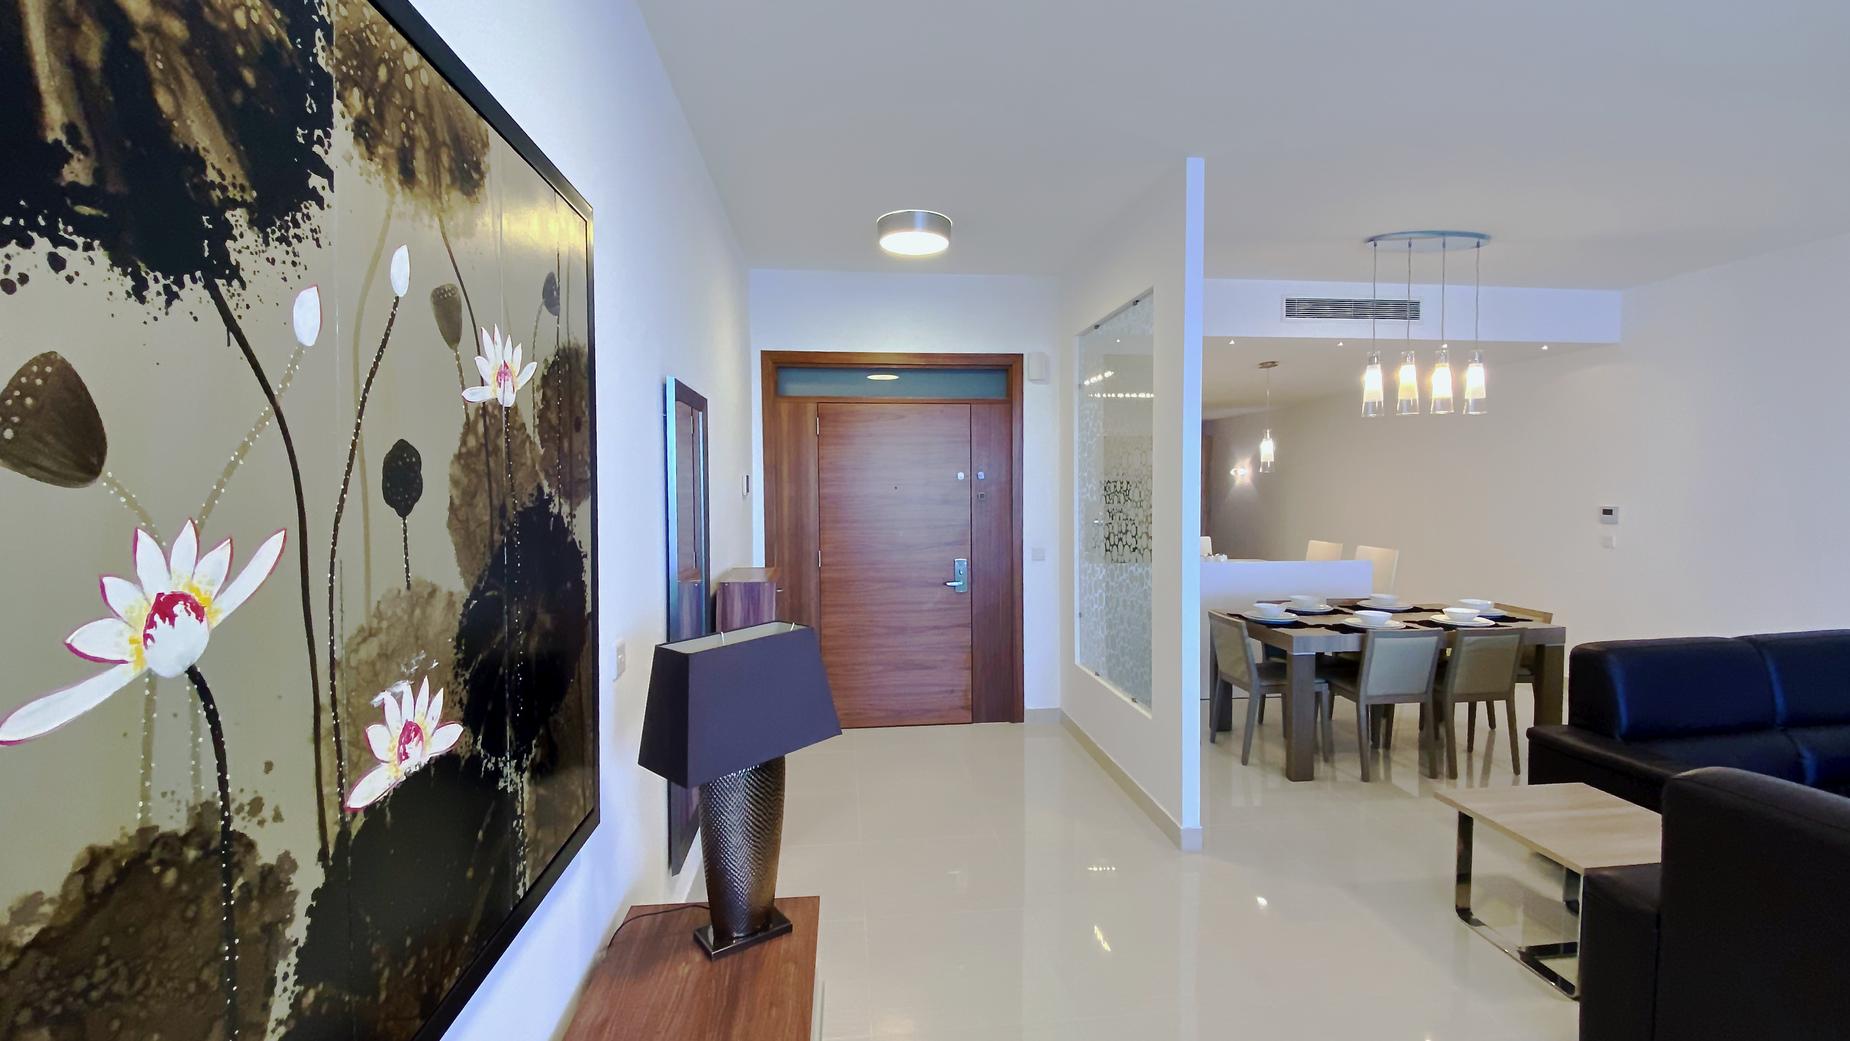 3 bed Apartment For Rent in Sliema, Sliema - thumb 4